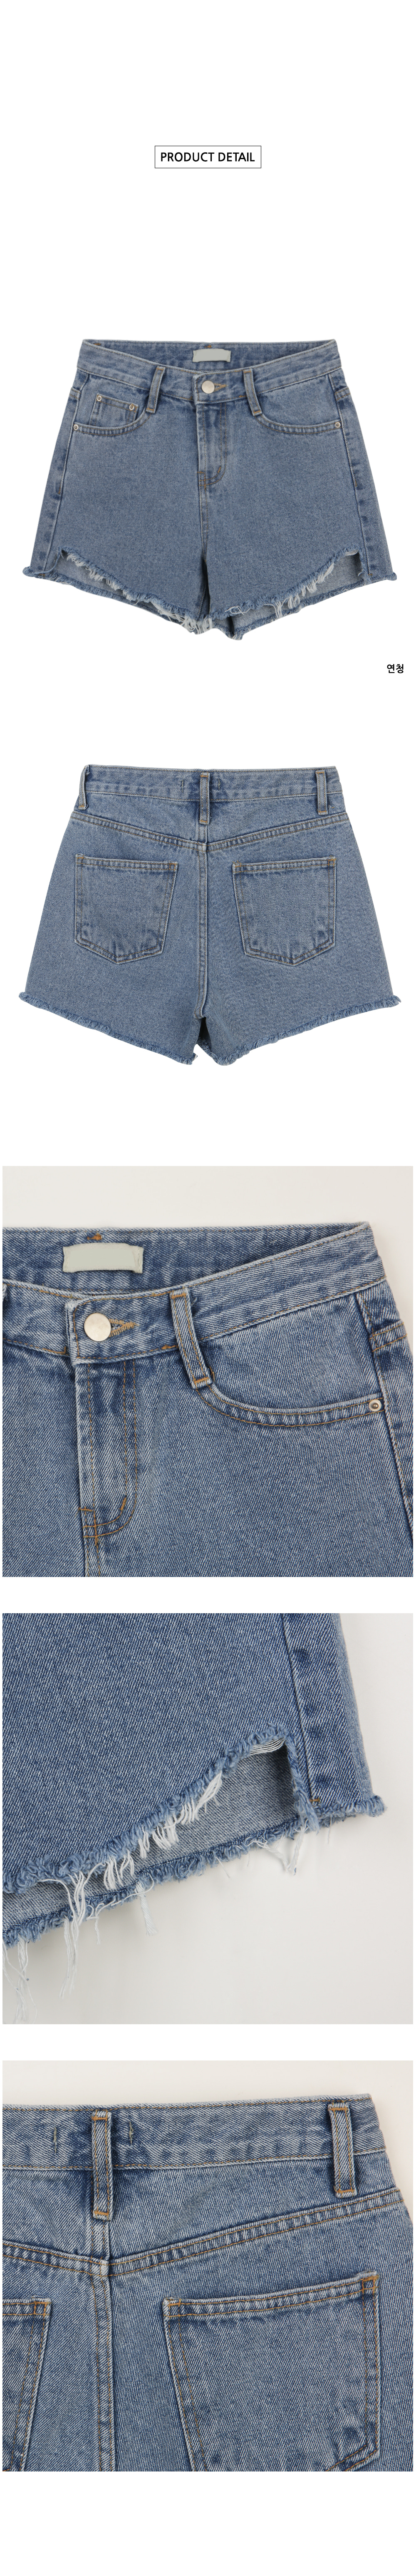 Trim cutting undress jeans pants P#YW465